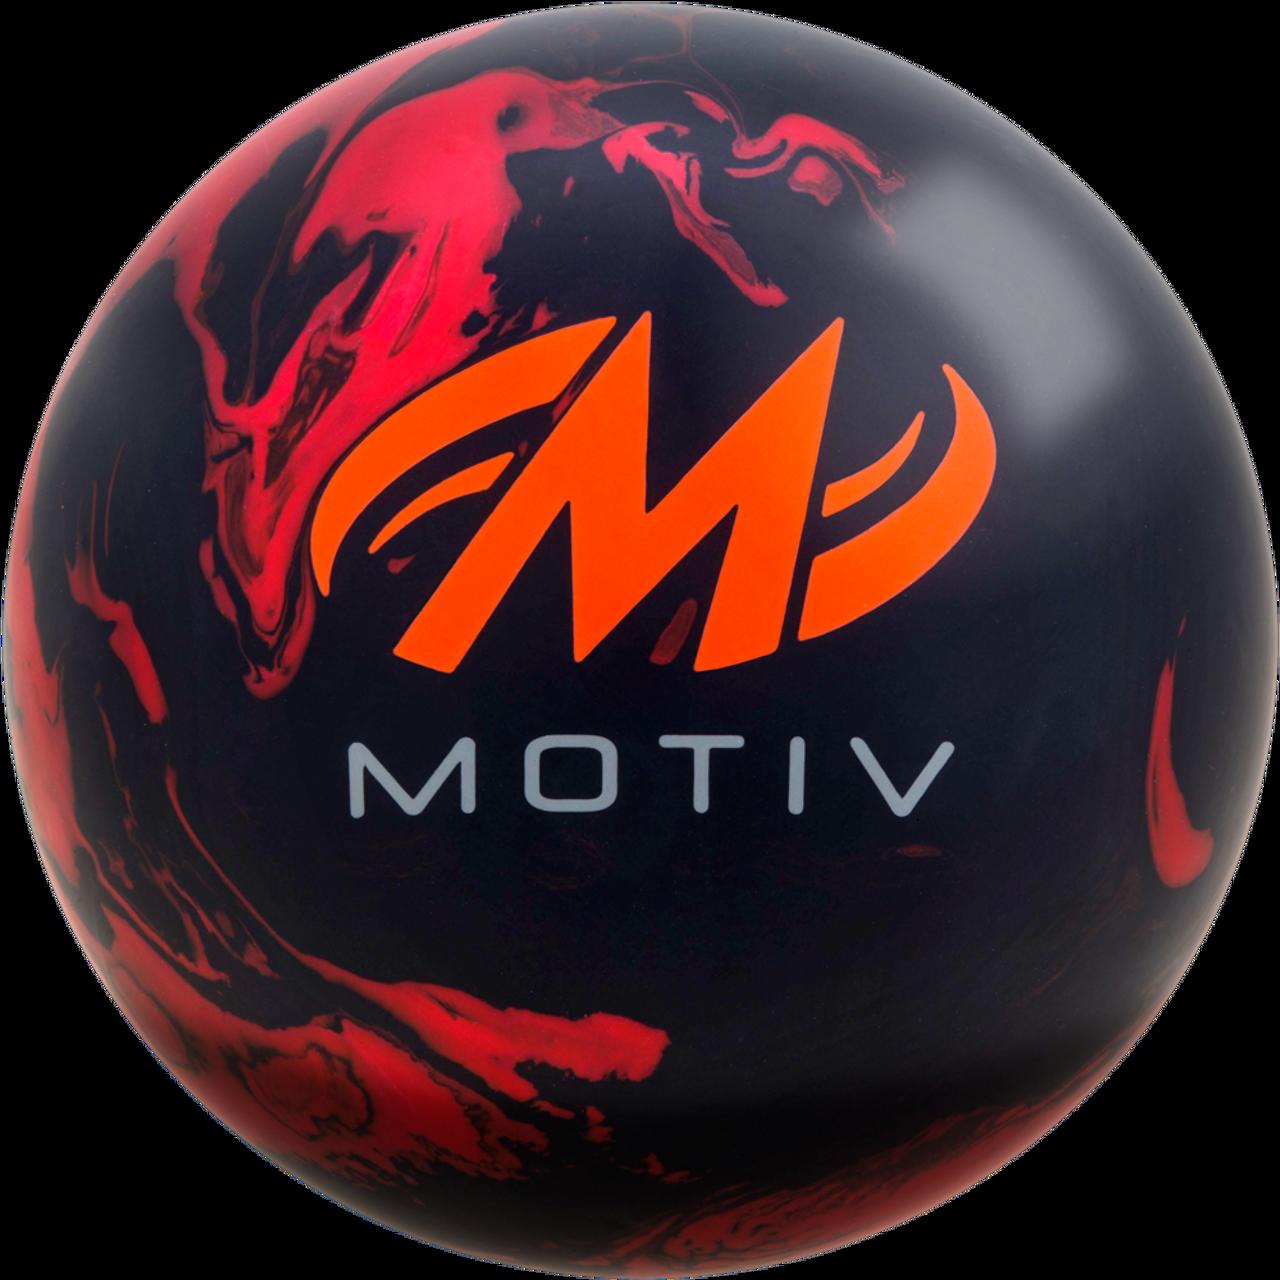 Motiv Forge Bowling Ball Back Side